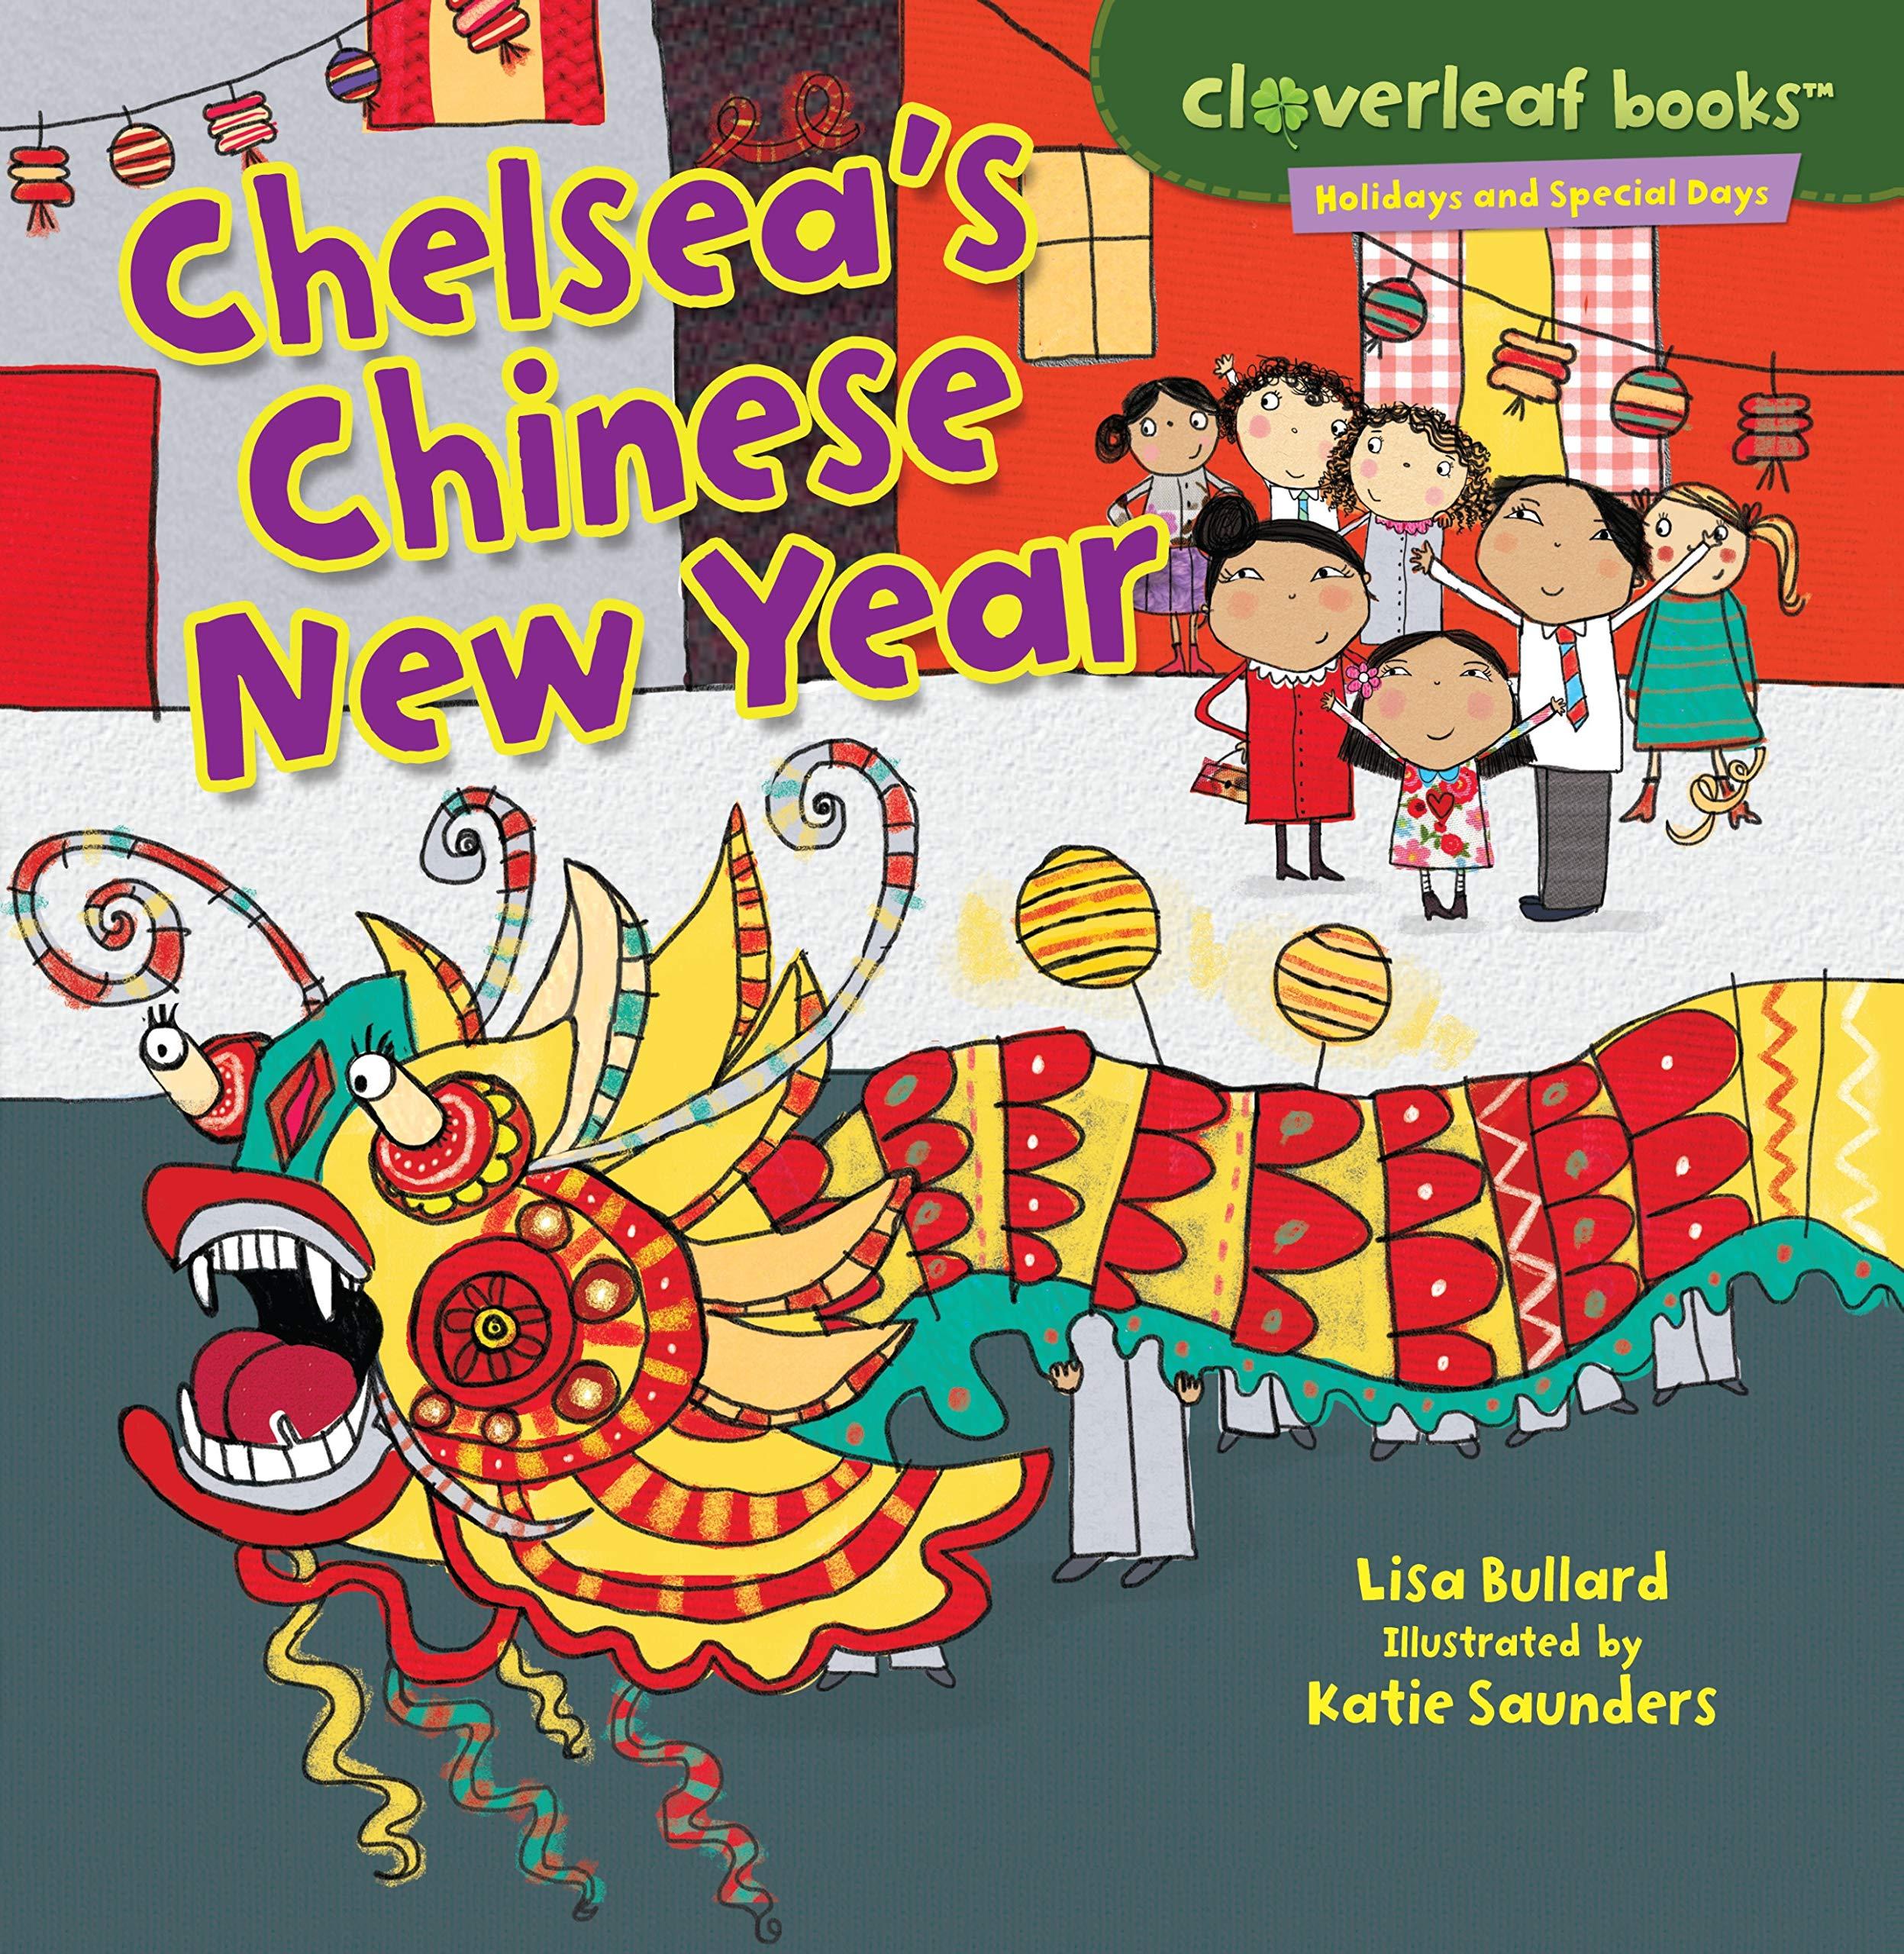 Amazon.com: Chelsea\'s Chinese New Year (Cloverleaf Books - Holidays ...